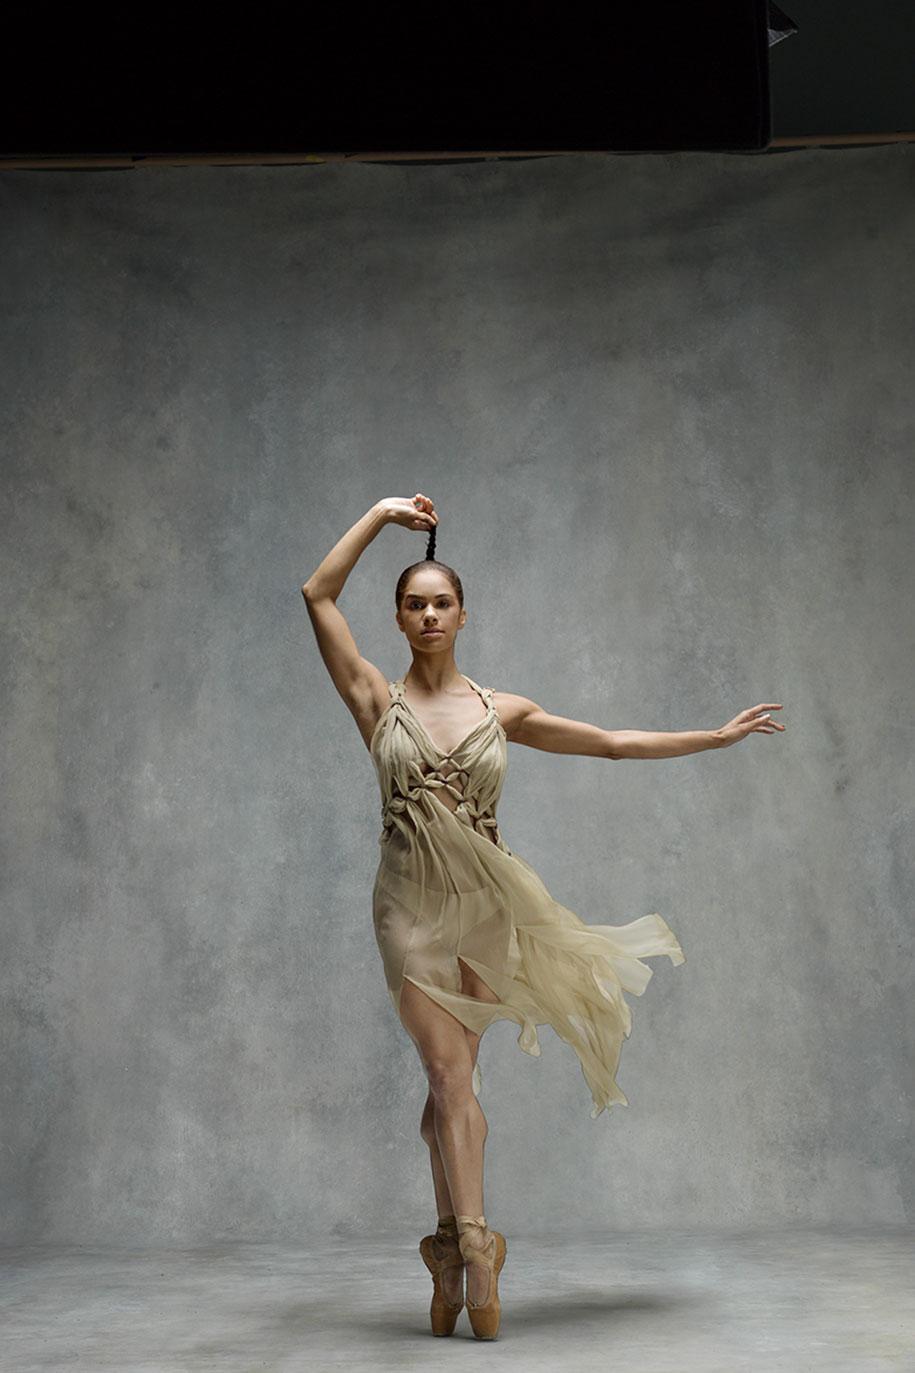 edgar-degas-ballet-dancer-painting-photoshoot-misty-copeland-harpers-bazaar-7